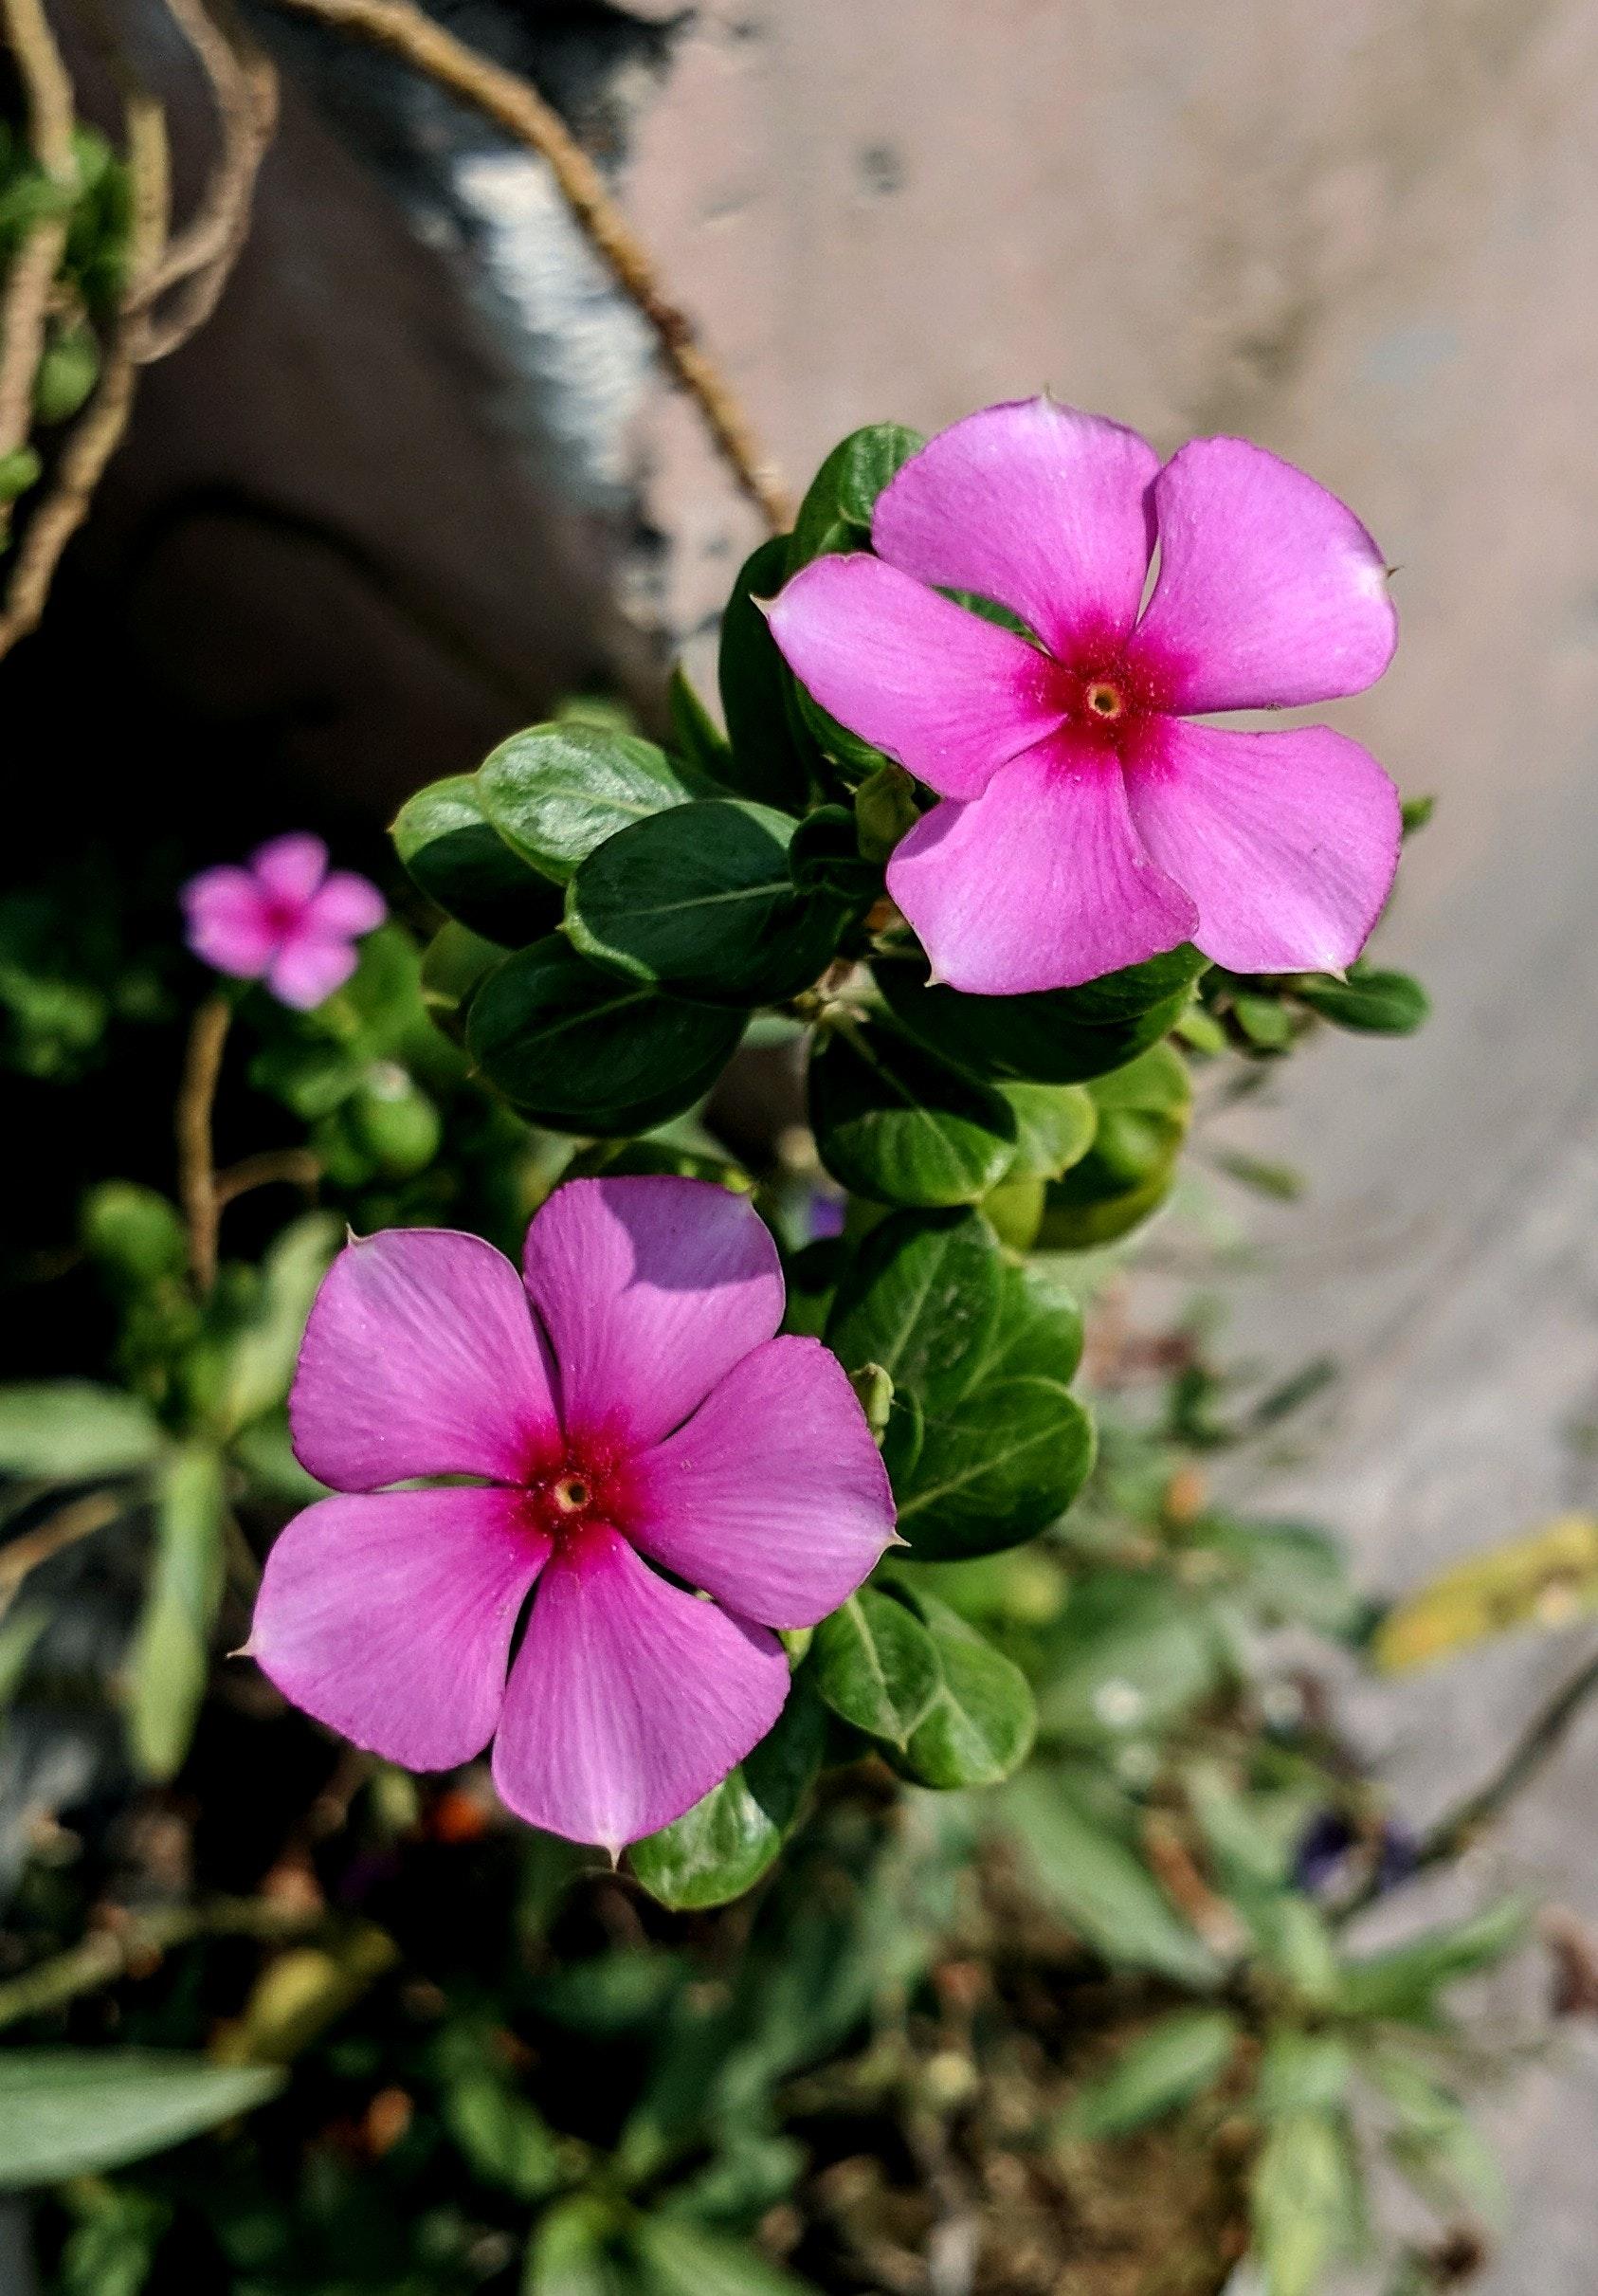 Free stock photo of beautiful flowers, flowers, fresh flowers